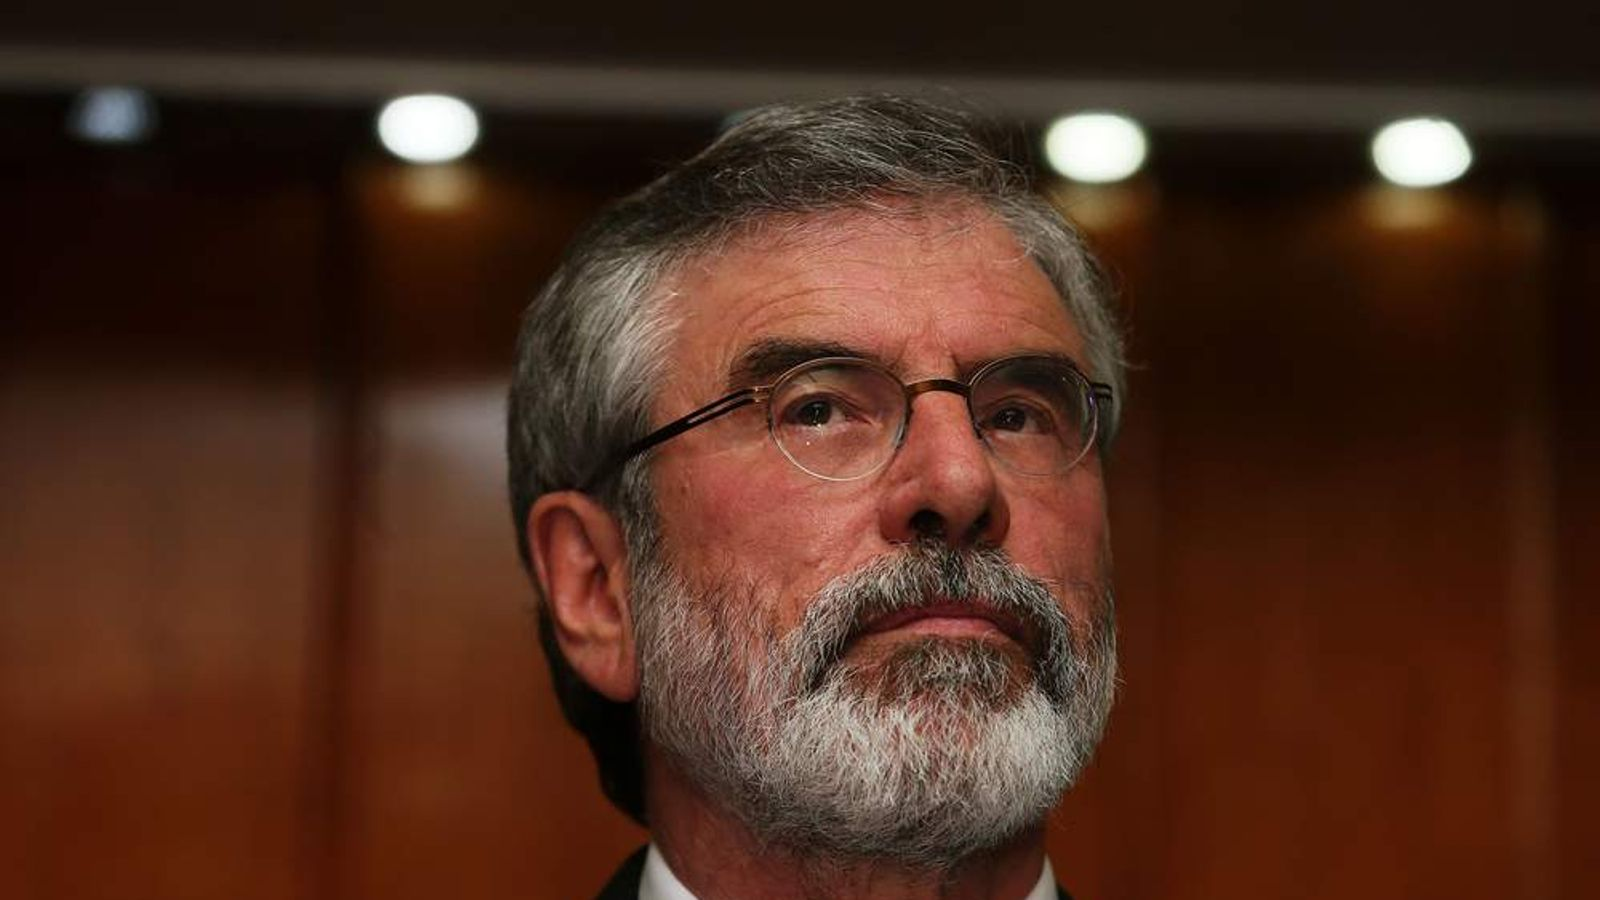 Sinn Fein President Gerry Adams released after questioning over Jean McConville murder